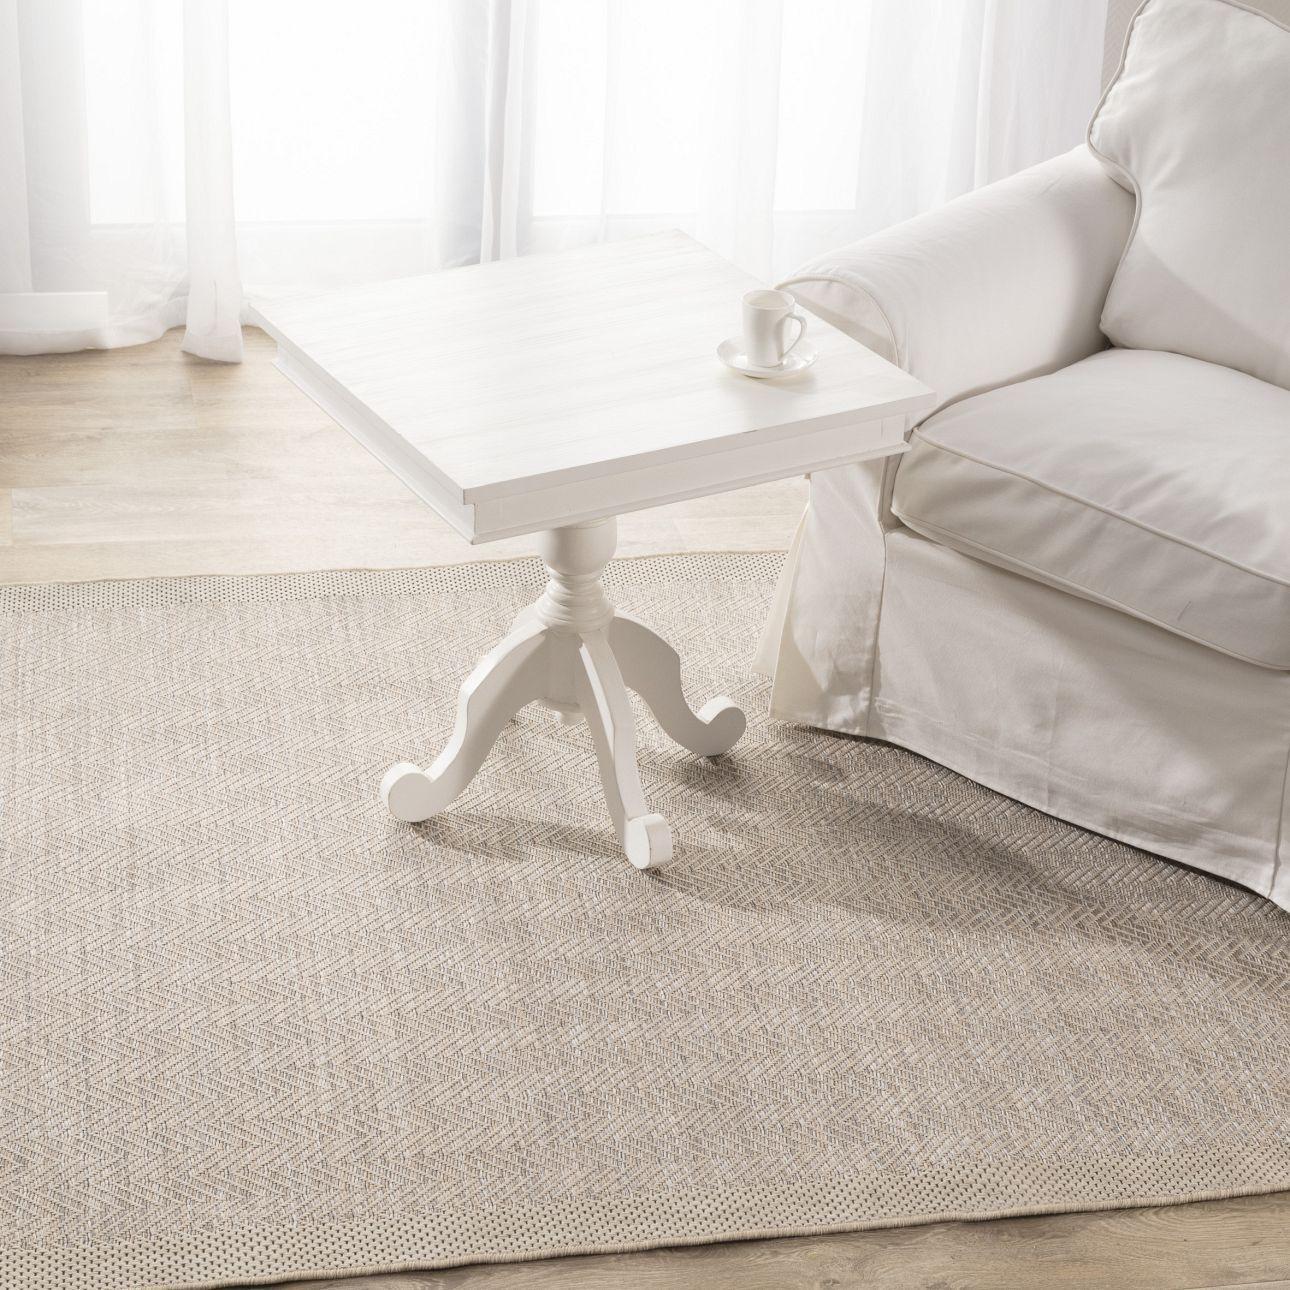 teppich breeze sand cliff grey 120x170cm white living pinterest teppichboden teppich. Black Bedroom Furniture Sets. Home Design Ideas